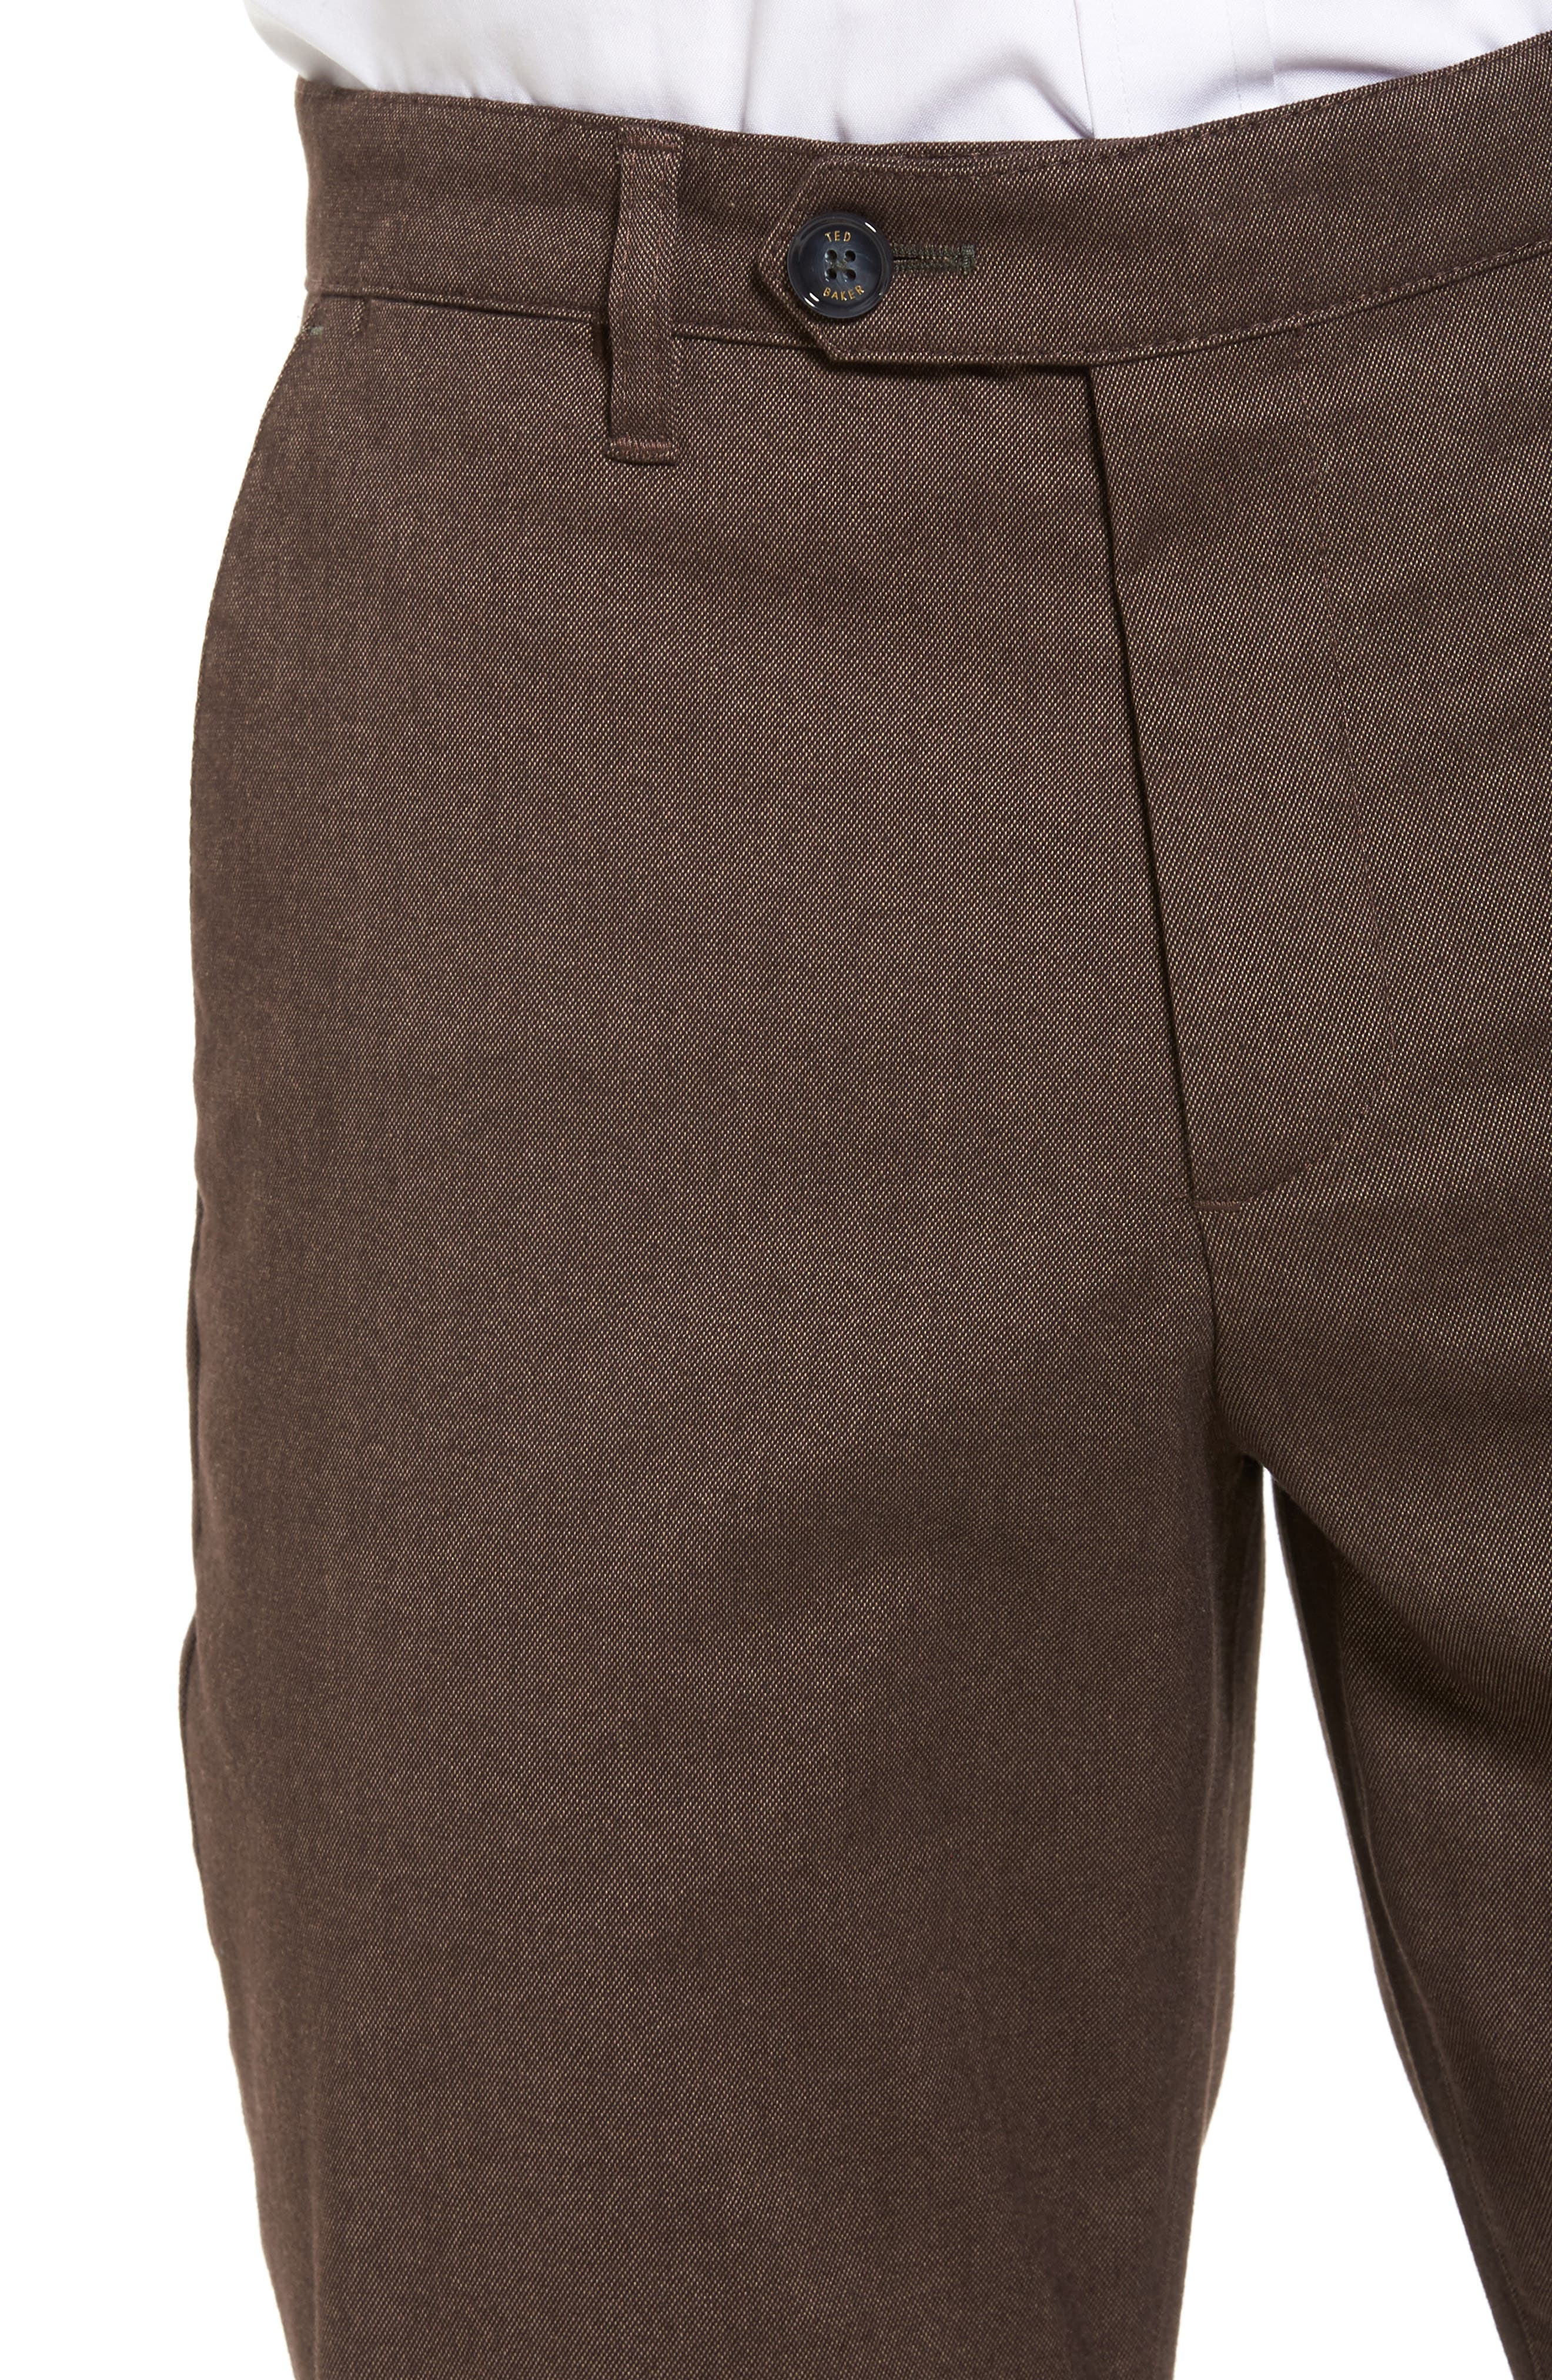 Freshman Modern Fit Brushed Pants,                             Alternate thumbnail 4, color,                             214